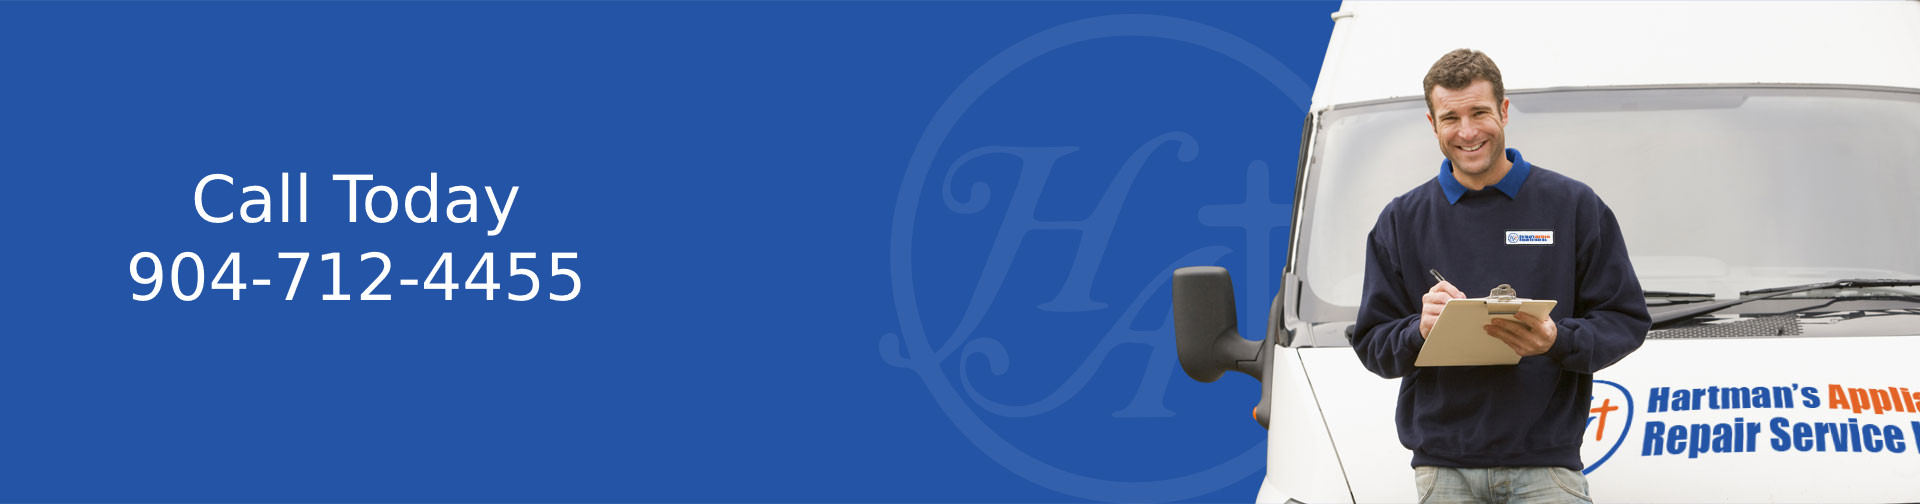 Professional Jacksonville Appliance Repair Fl Hartman S